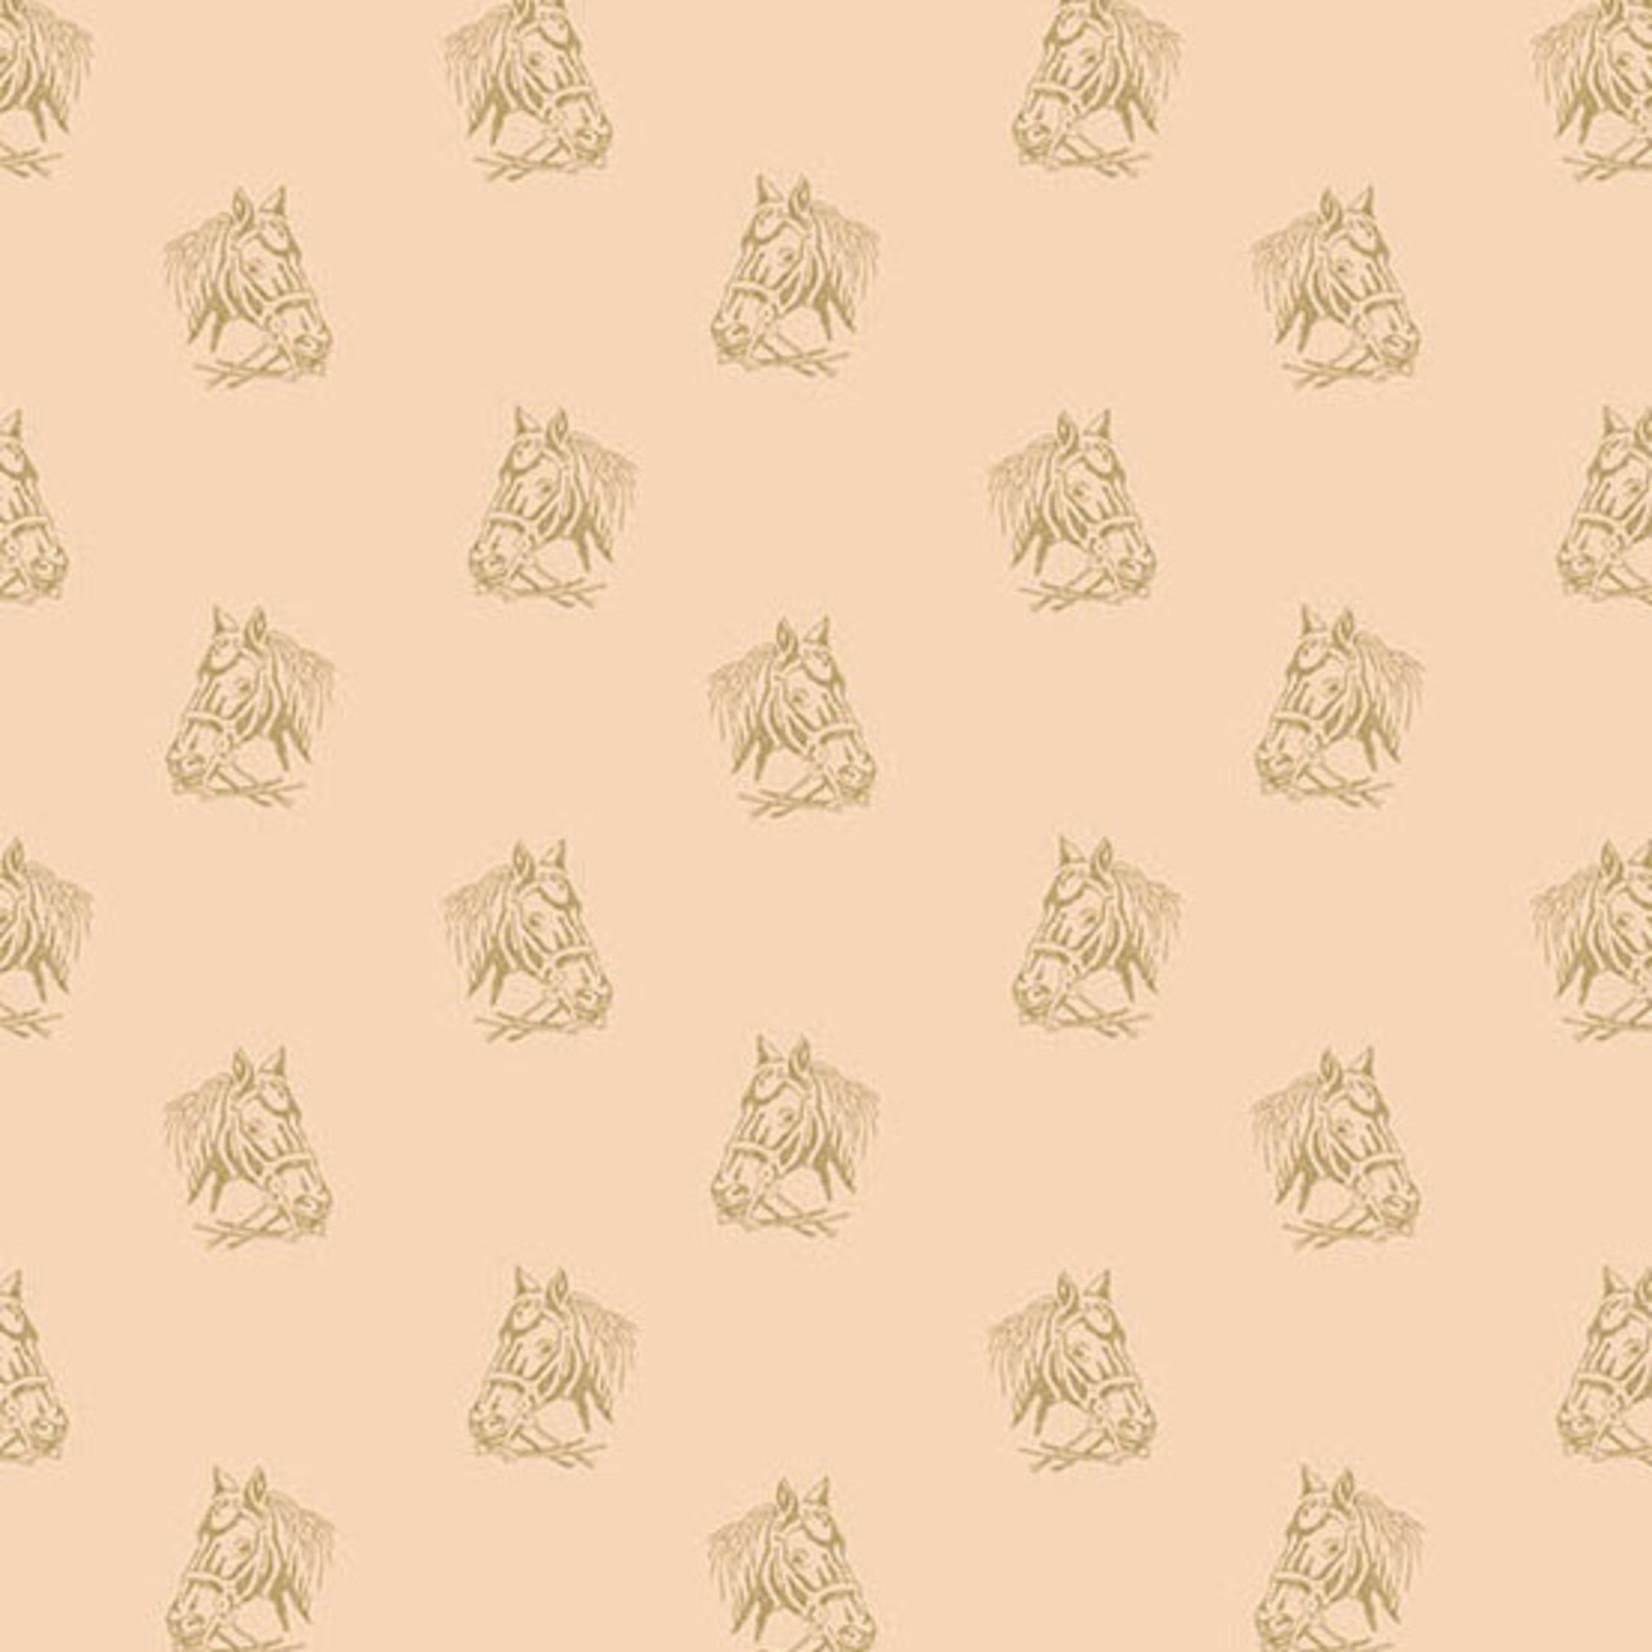 Edyta Sitar Secret Stash - Warms, Painted Pony, Pink (8627-P) $0.20 per cm or $20/m